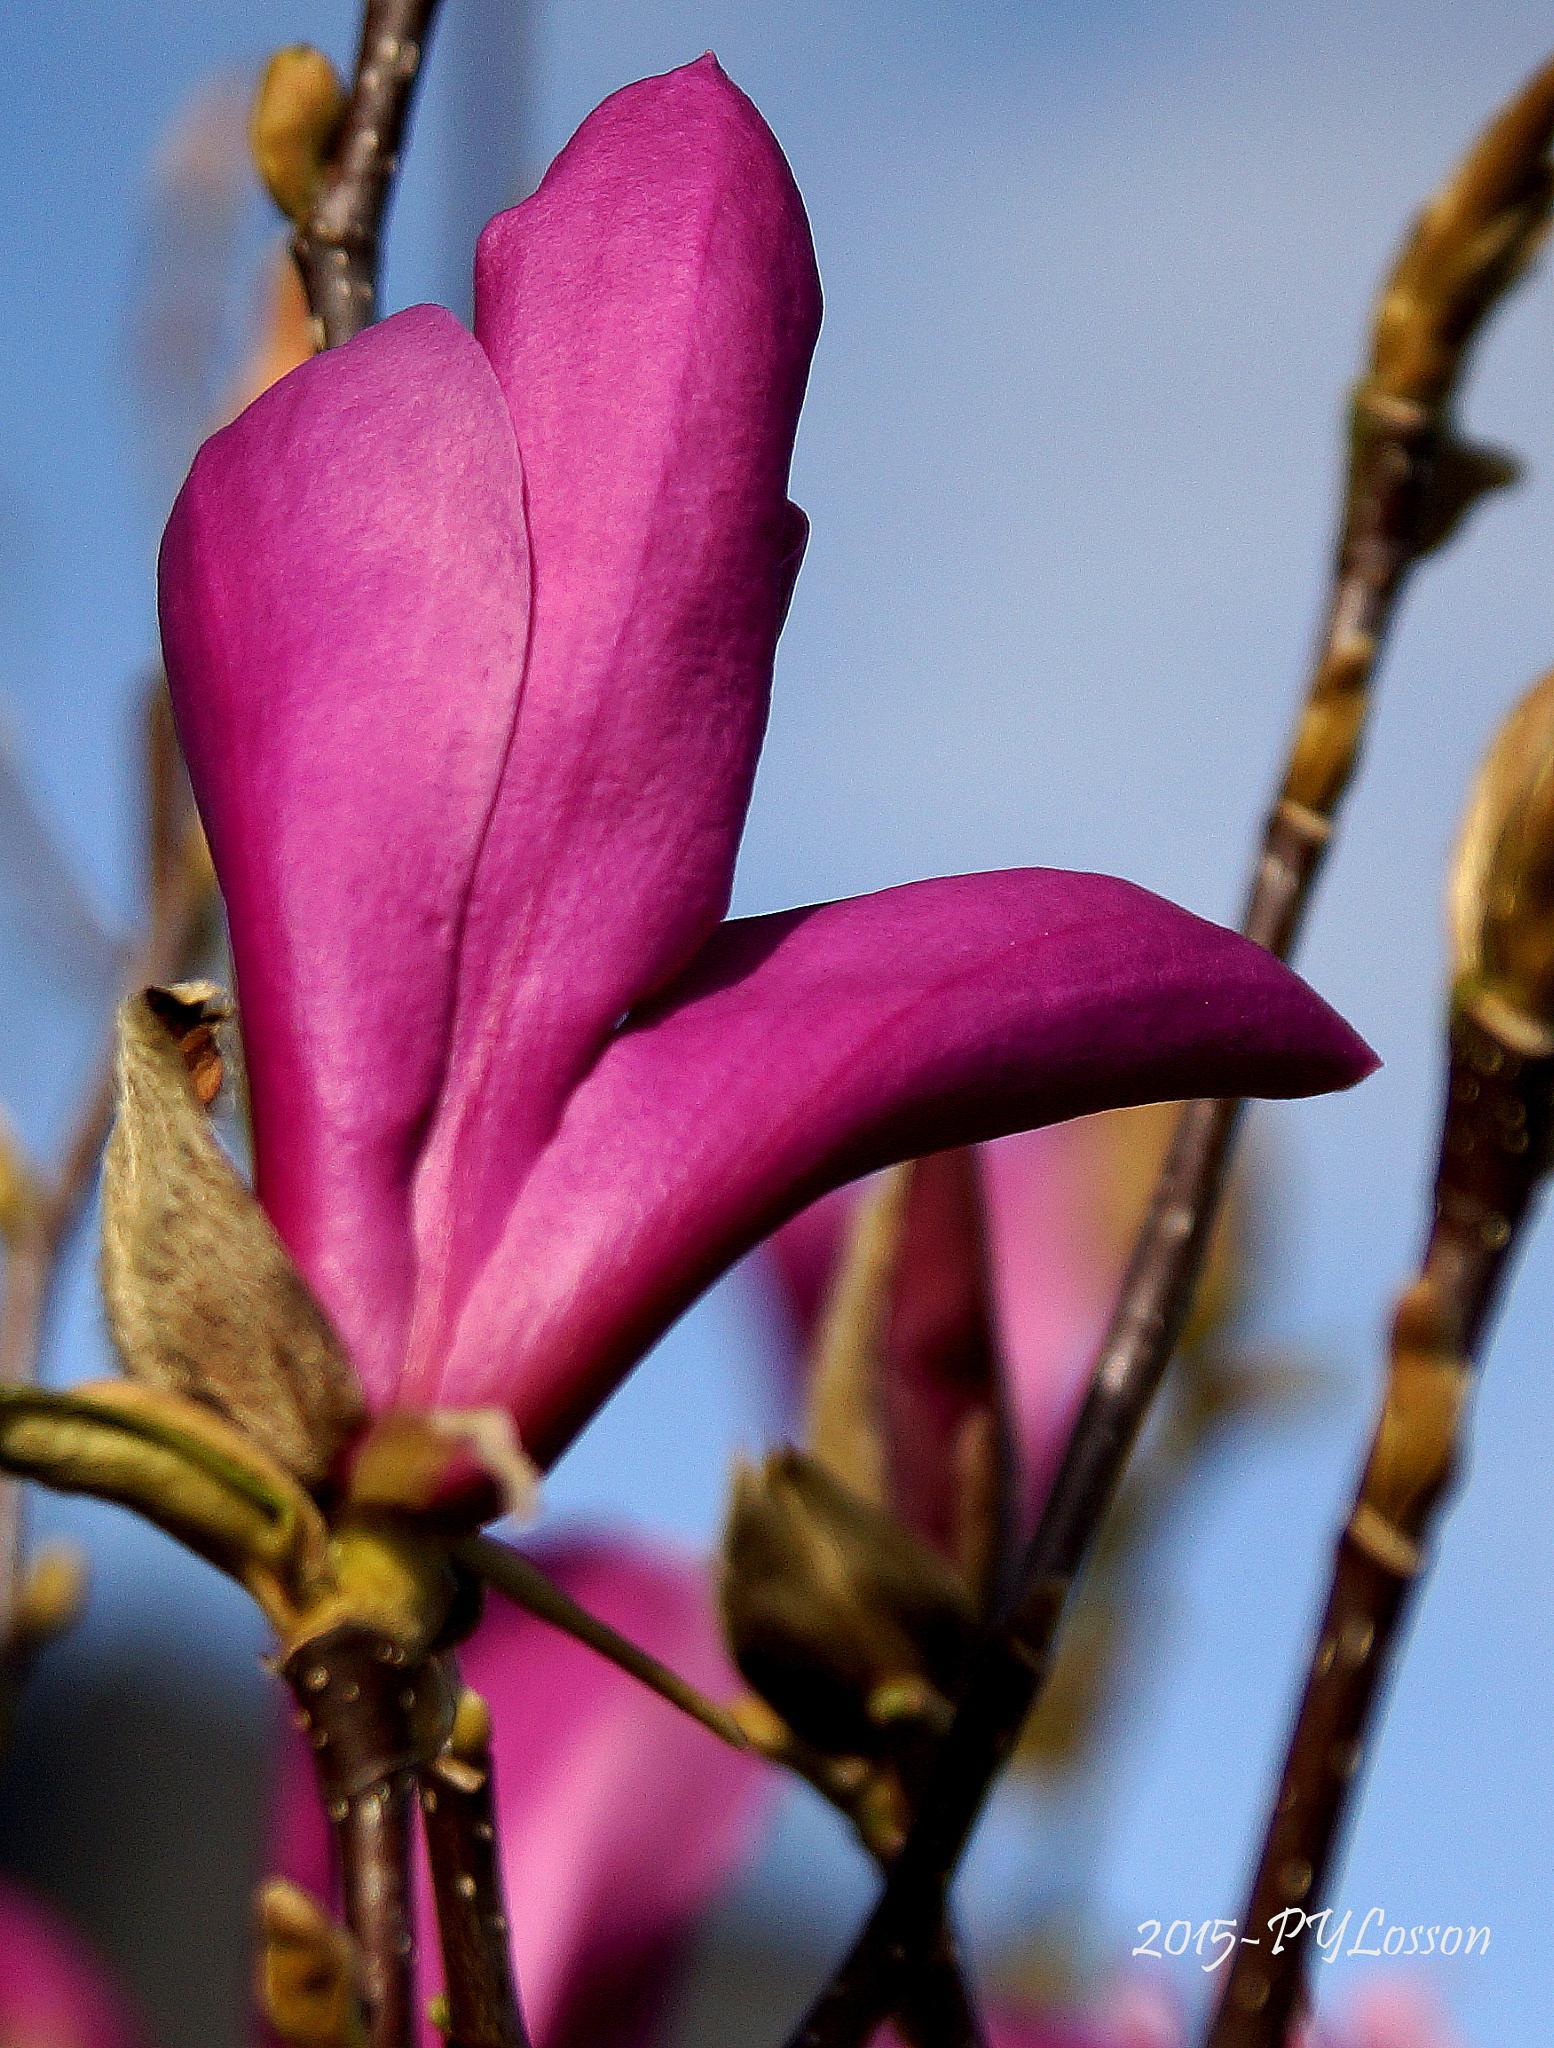 Magnolia by Pierre-Yves Losson